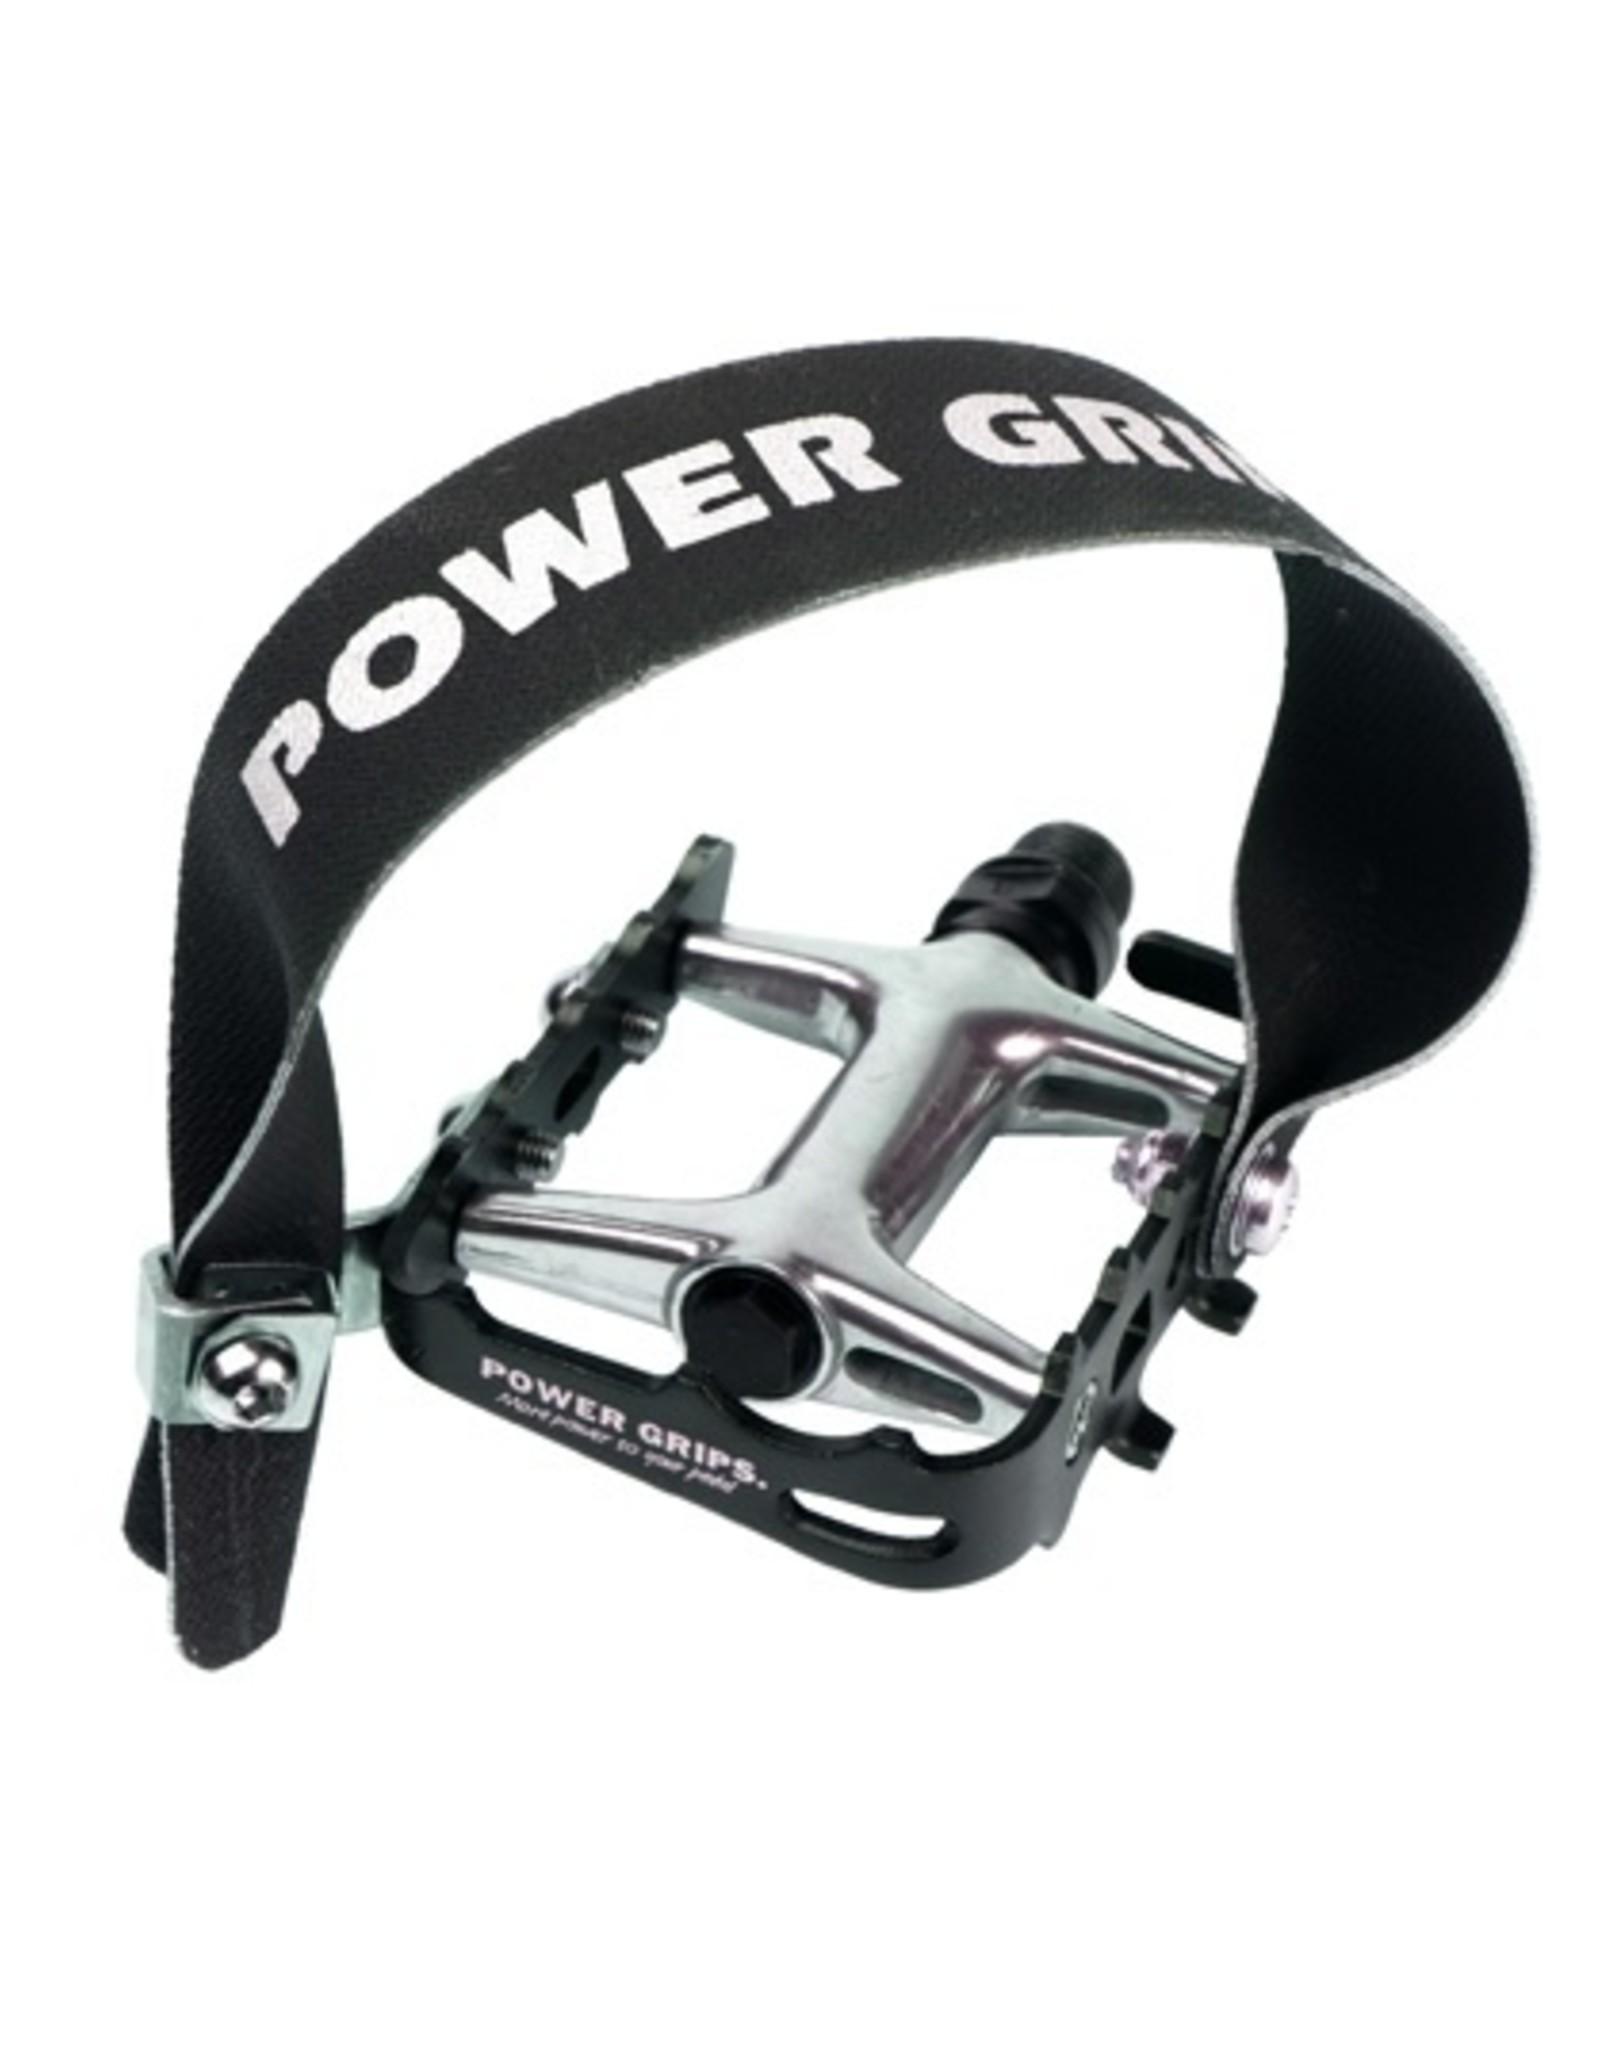 "Pedal - Power Grips High, Aluminum, 9/16"" Black"